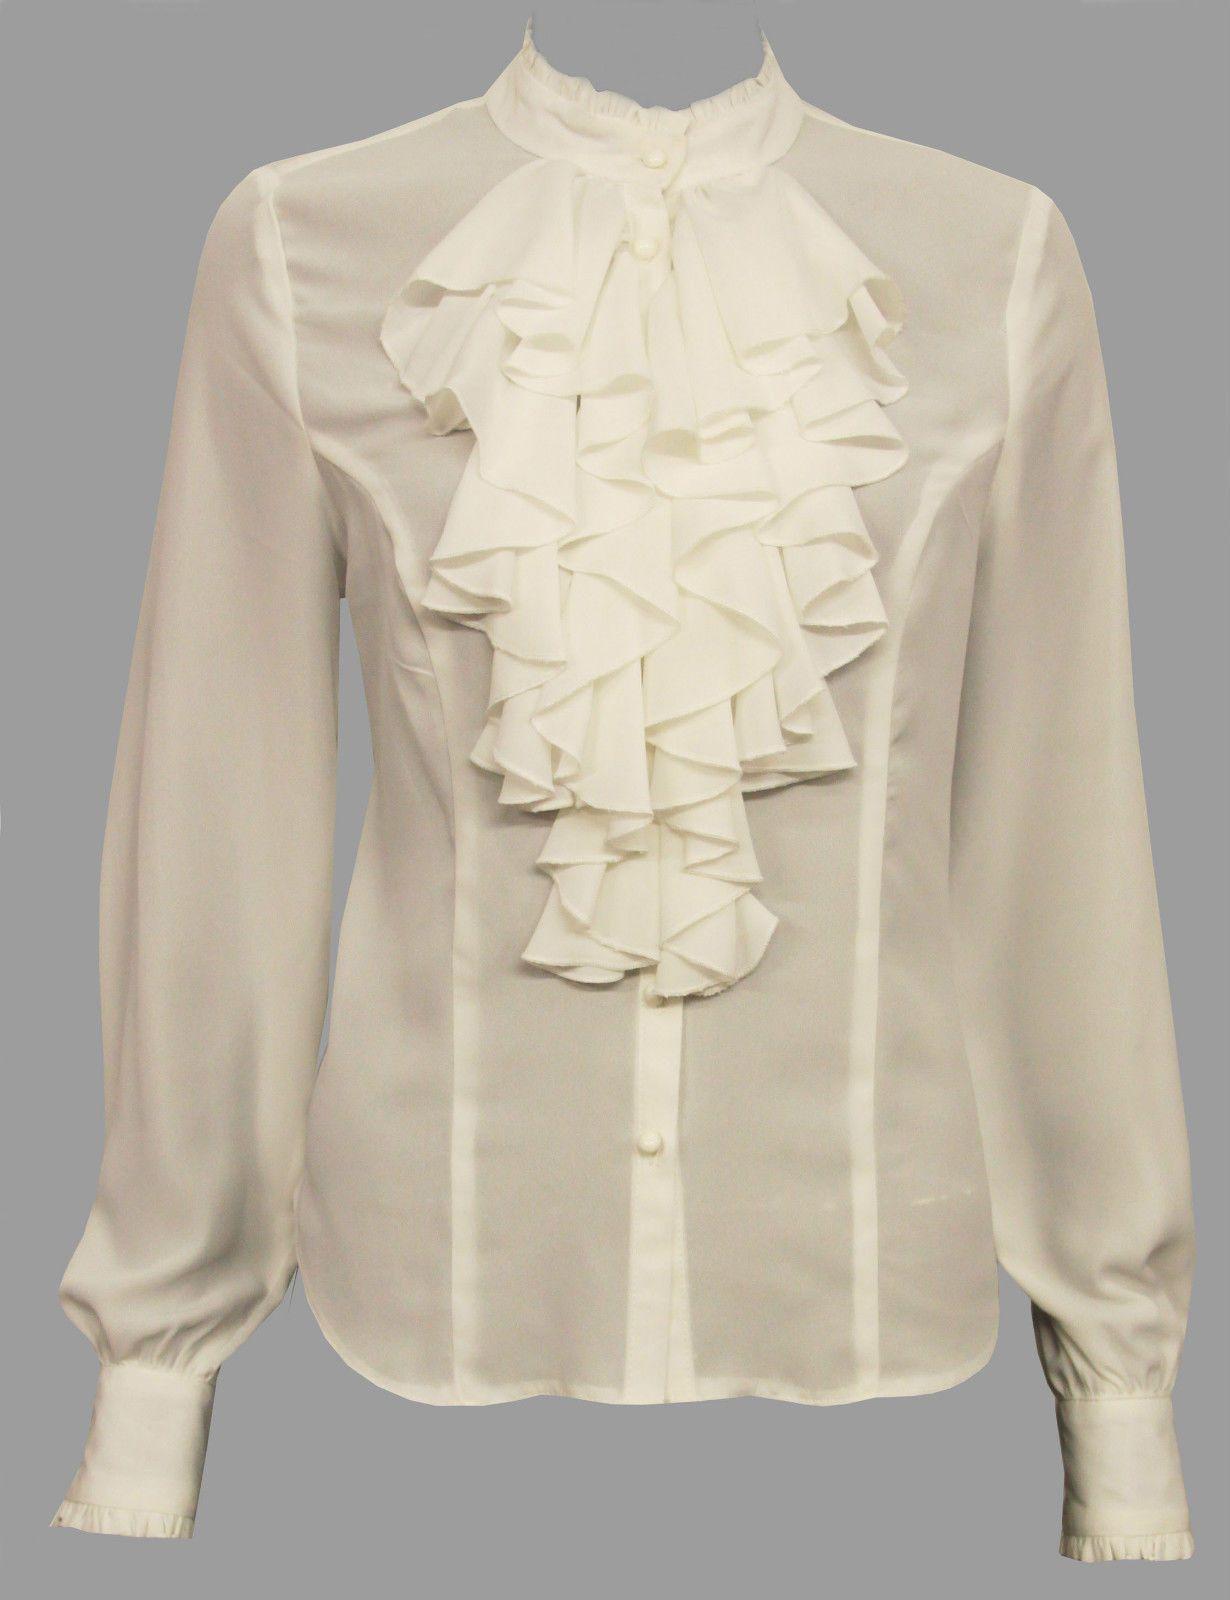 dfe316c60562e Bnwt ivory frilly blouse sizes 10